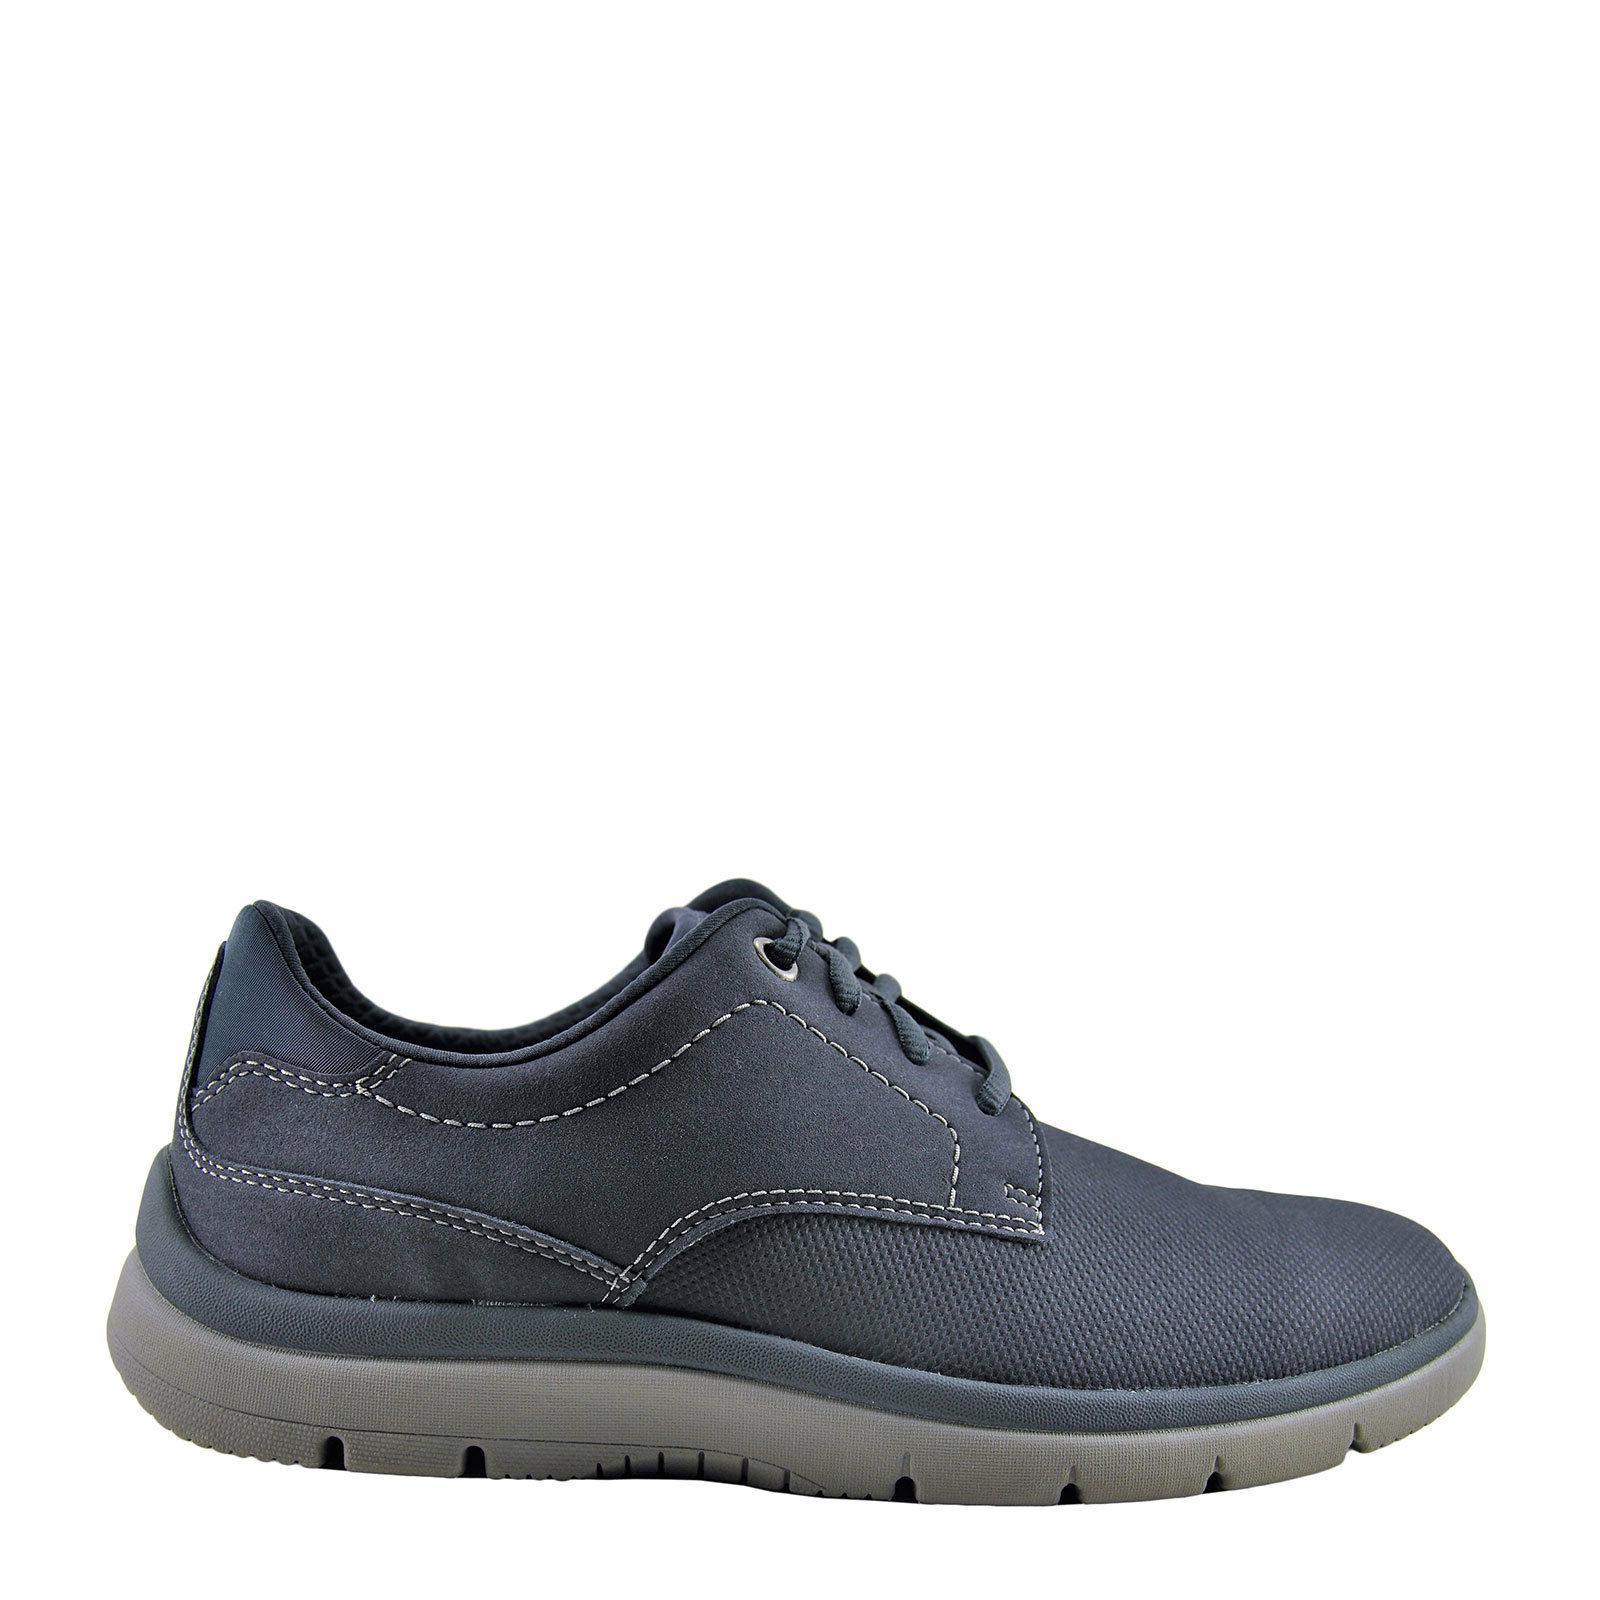 Clarks Tunsil Plain Navy Men's Oxford Fashion Sneaker 27760